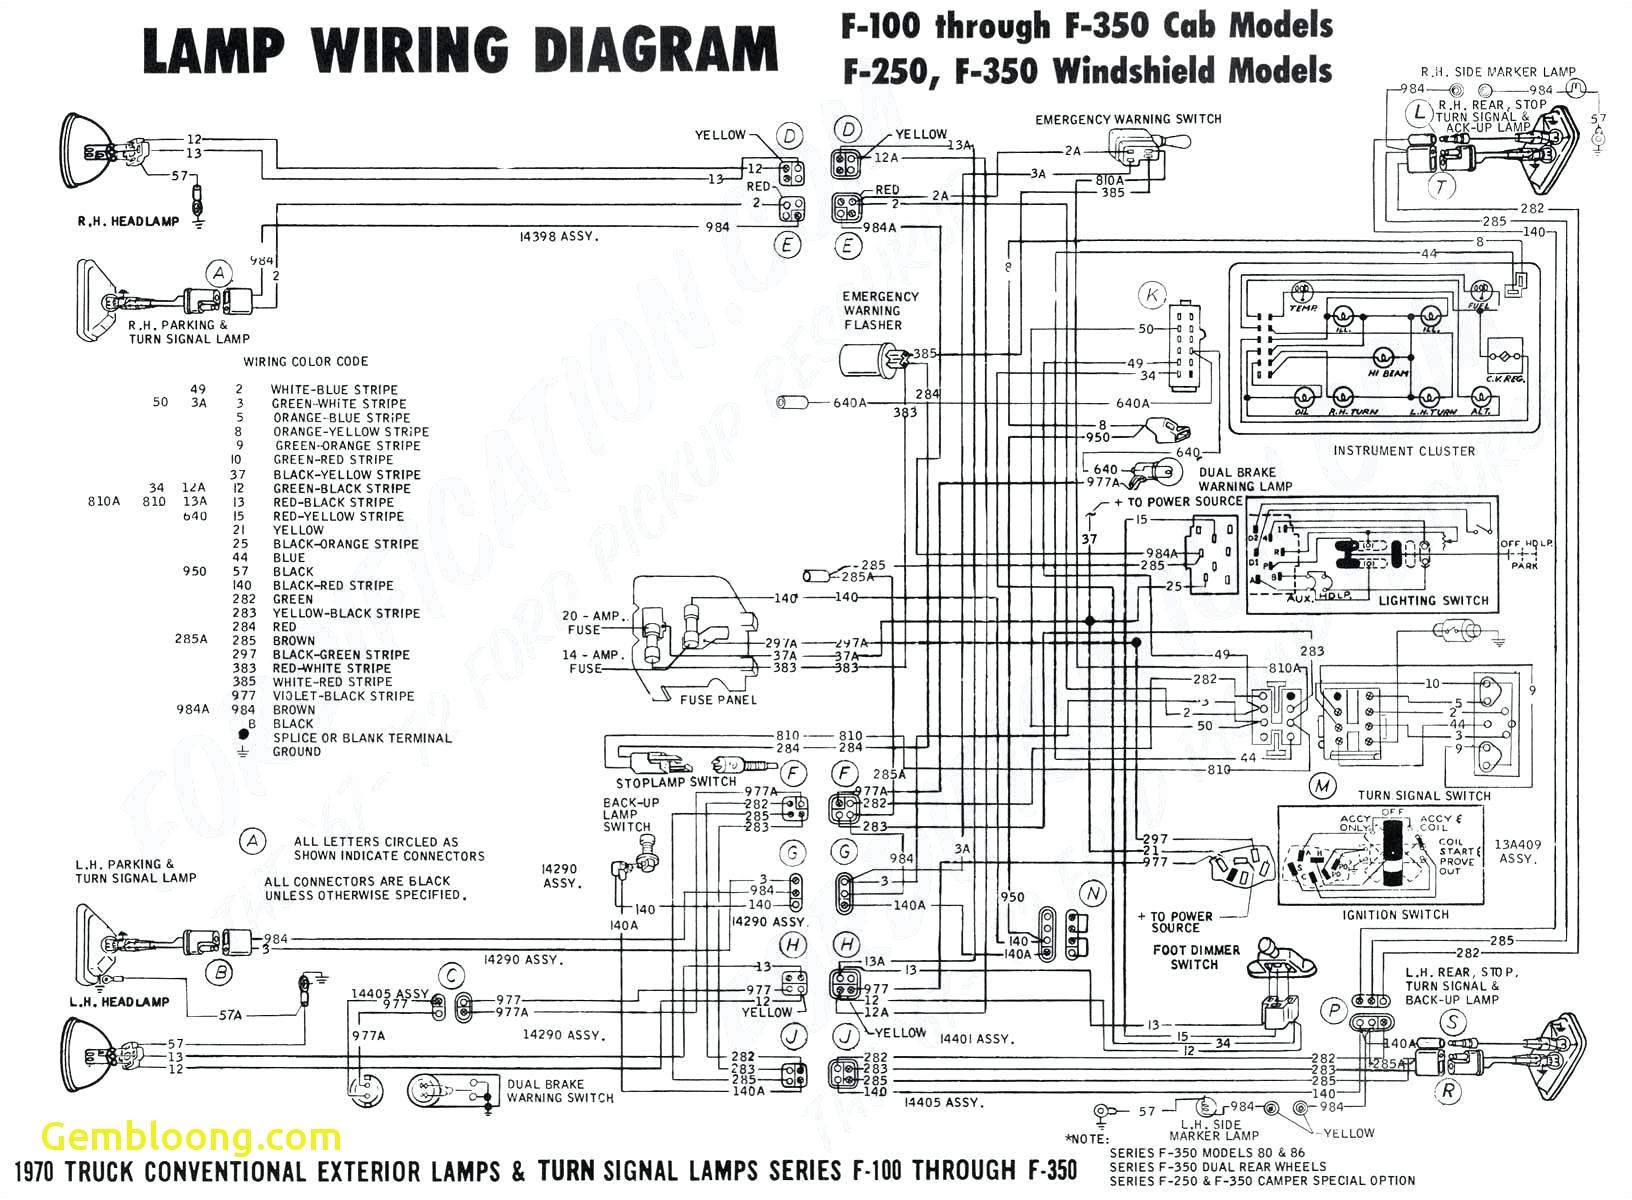 2004 Mazda 3 Stereo Wiring Diagram 2008 Mazda 3 Radio Wiring Diagram Wiring Diagram Database